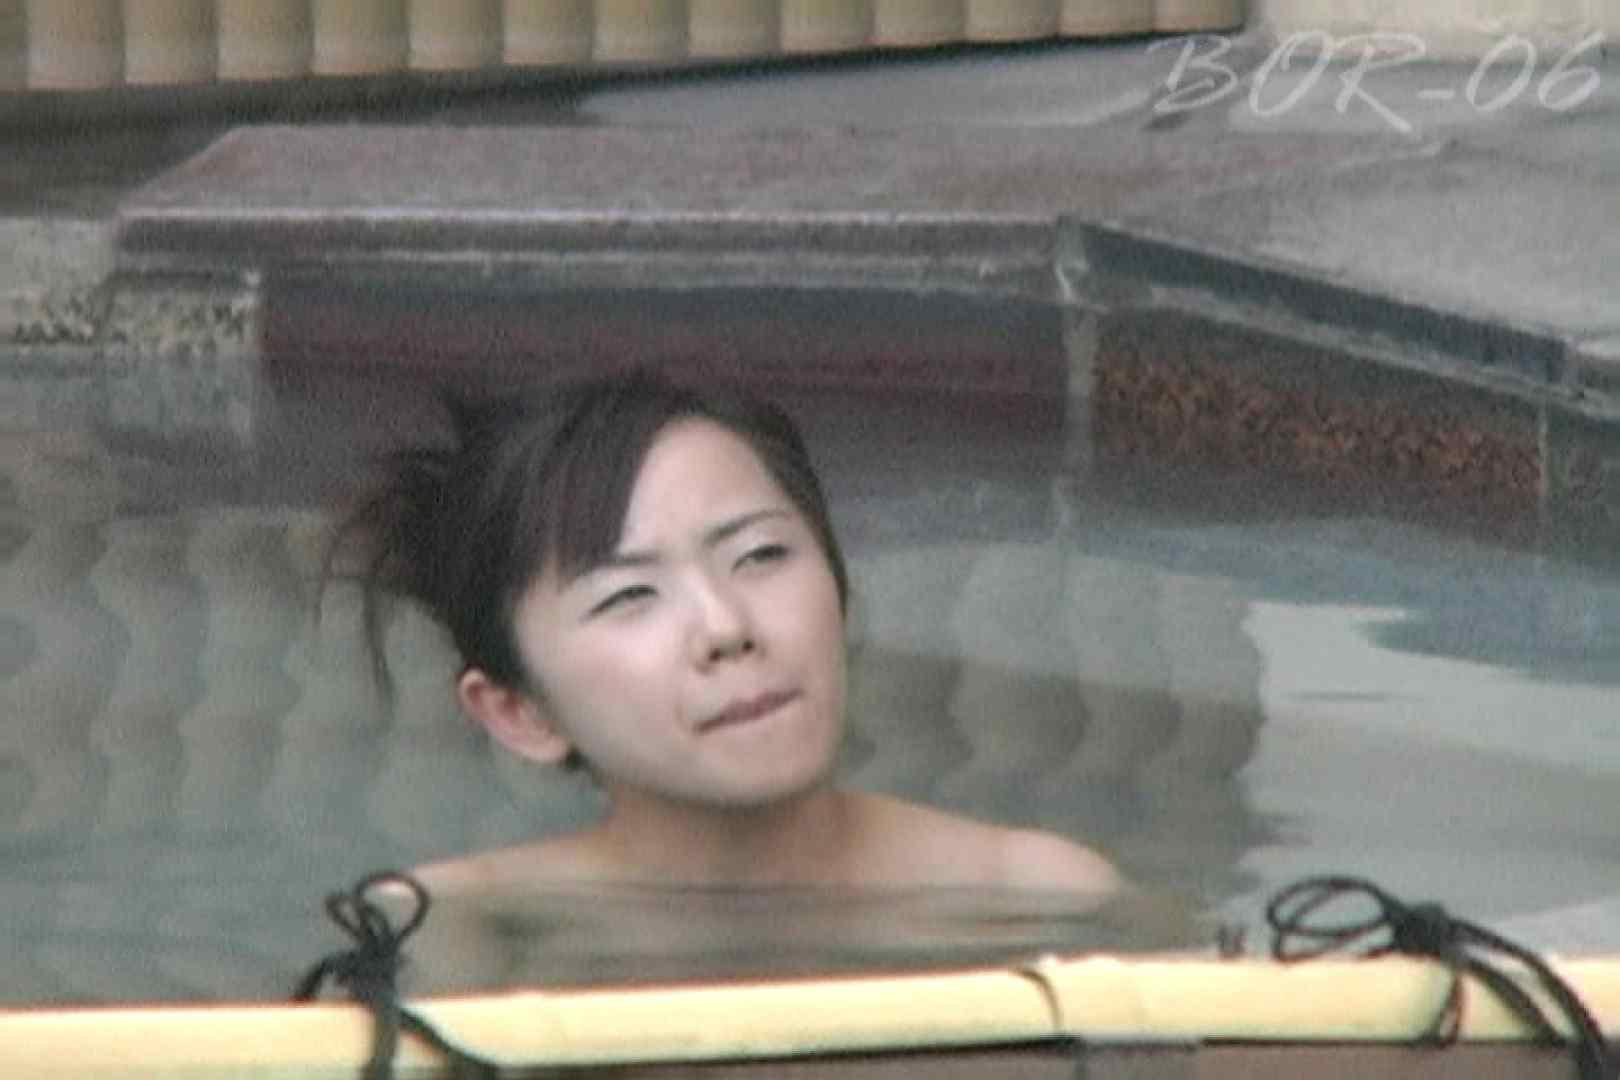 Aquaな露天風呂Vol.521 露天 おめこ無修正動画無料 92画像 53